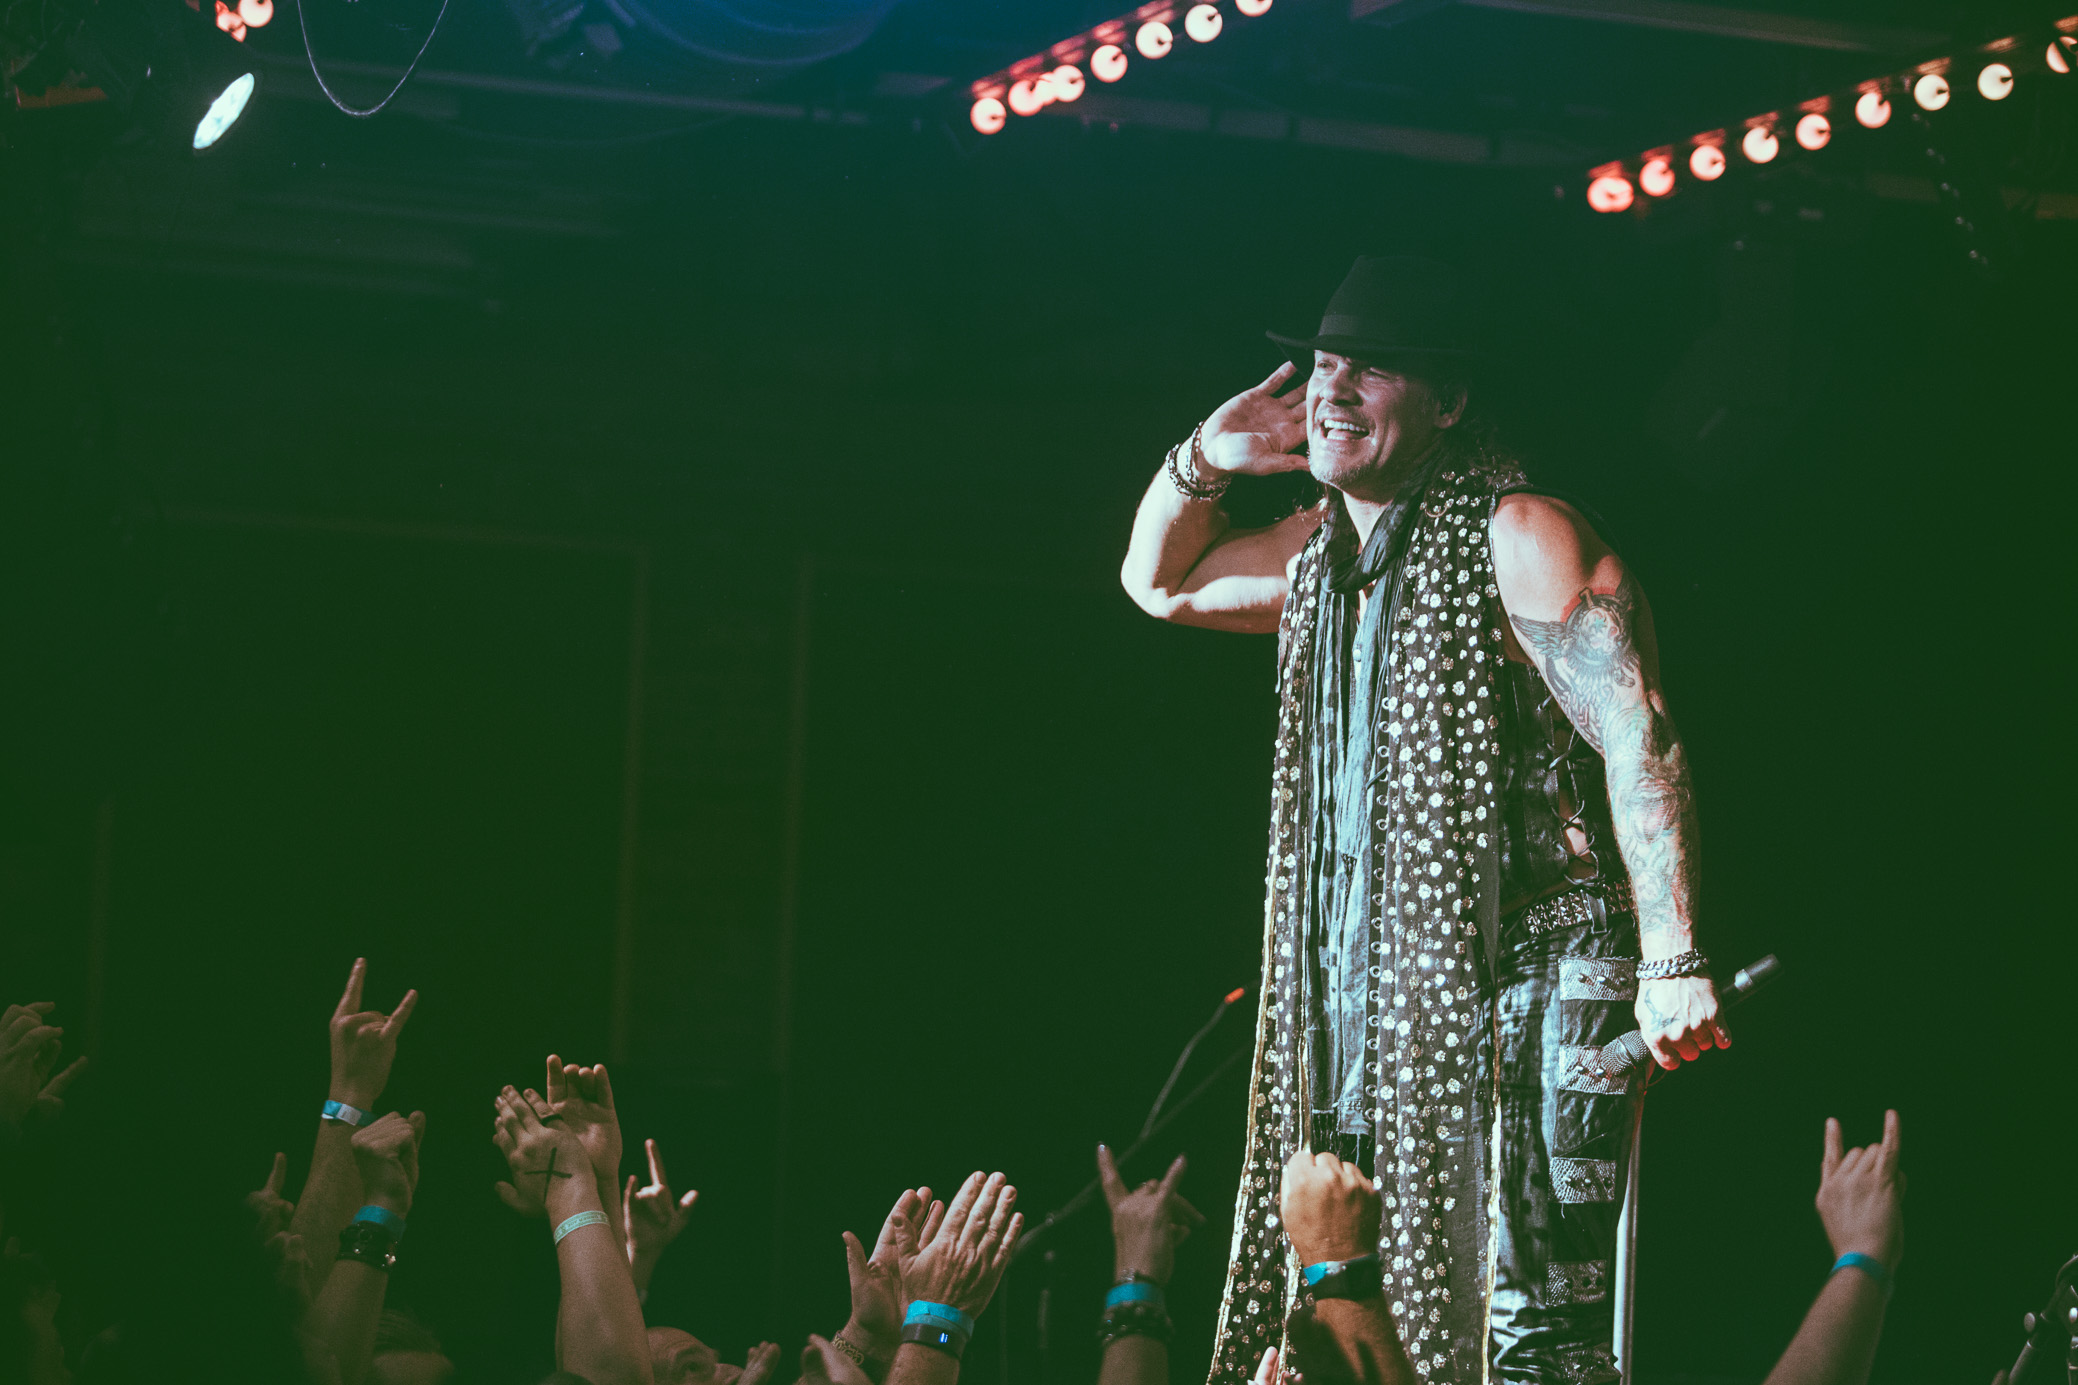 Fozzy Chris Jericho Concert Photography